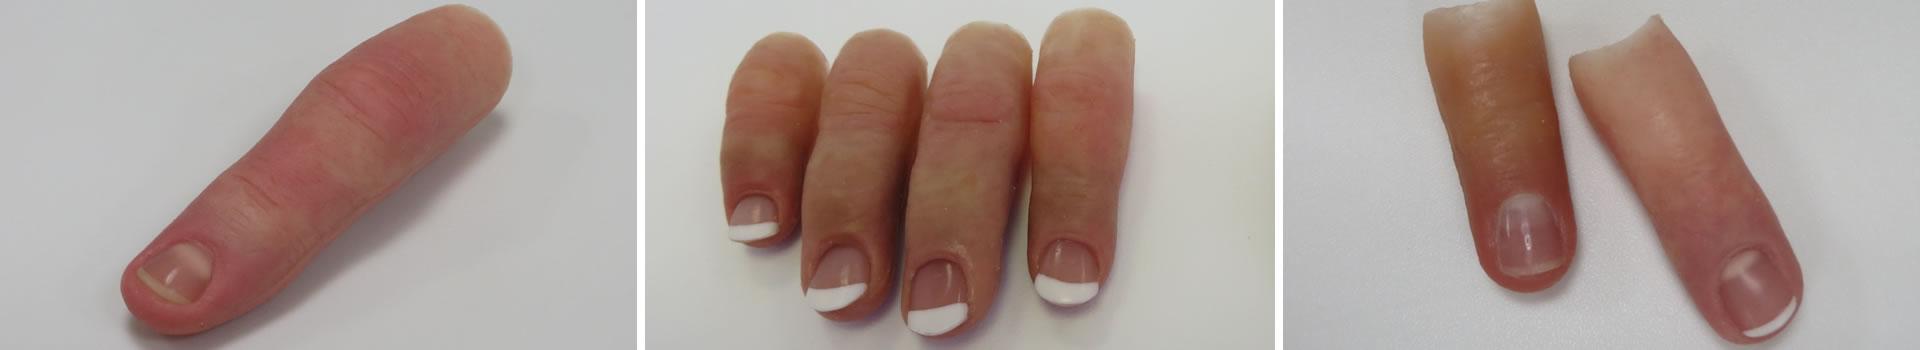 Silicone Finger Prosthetics